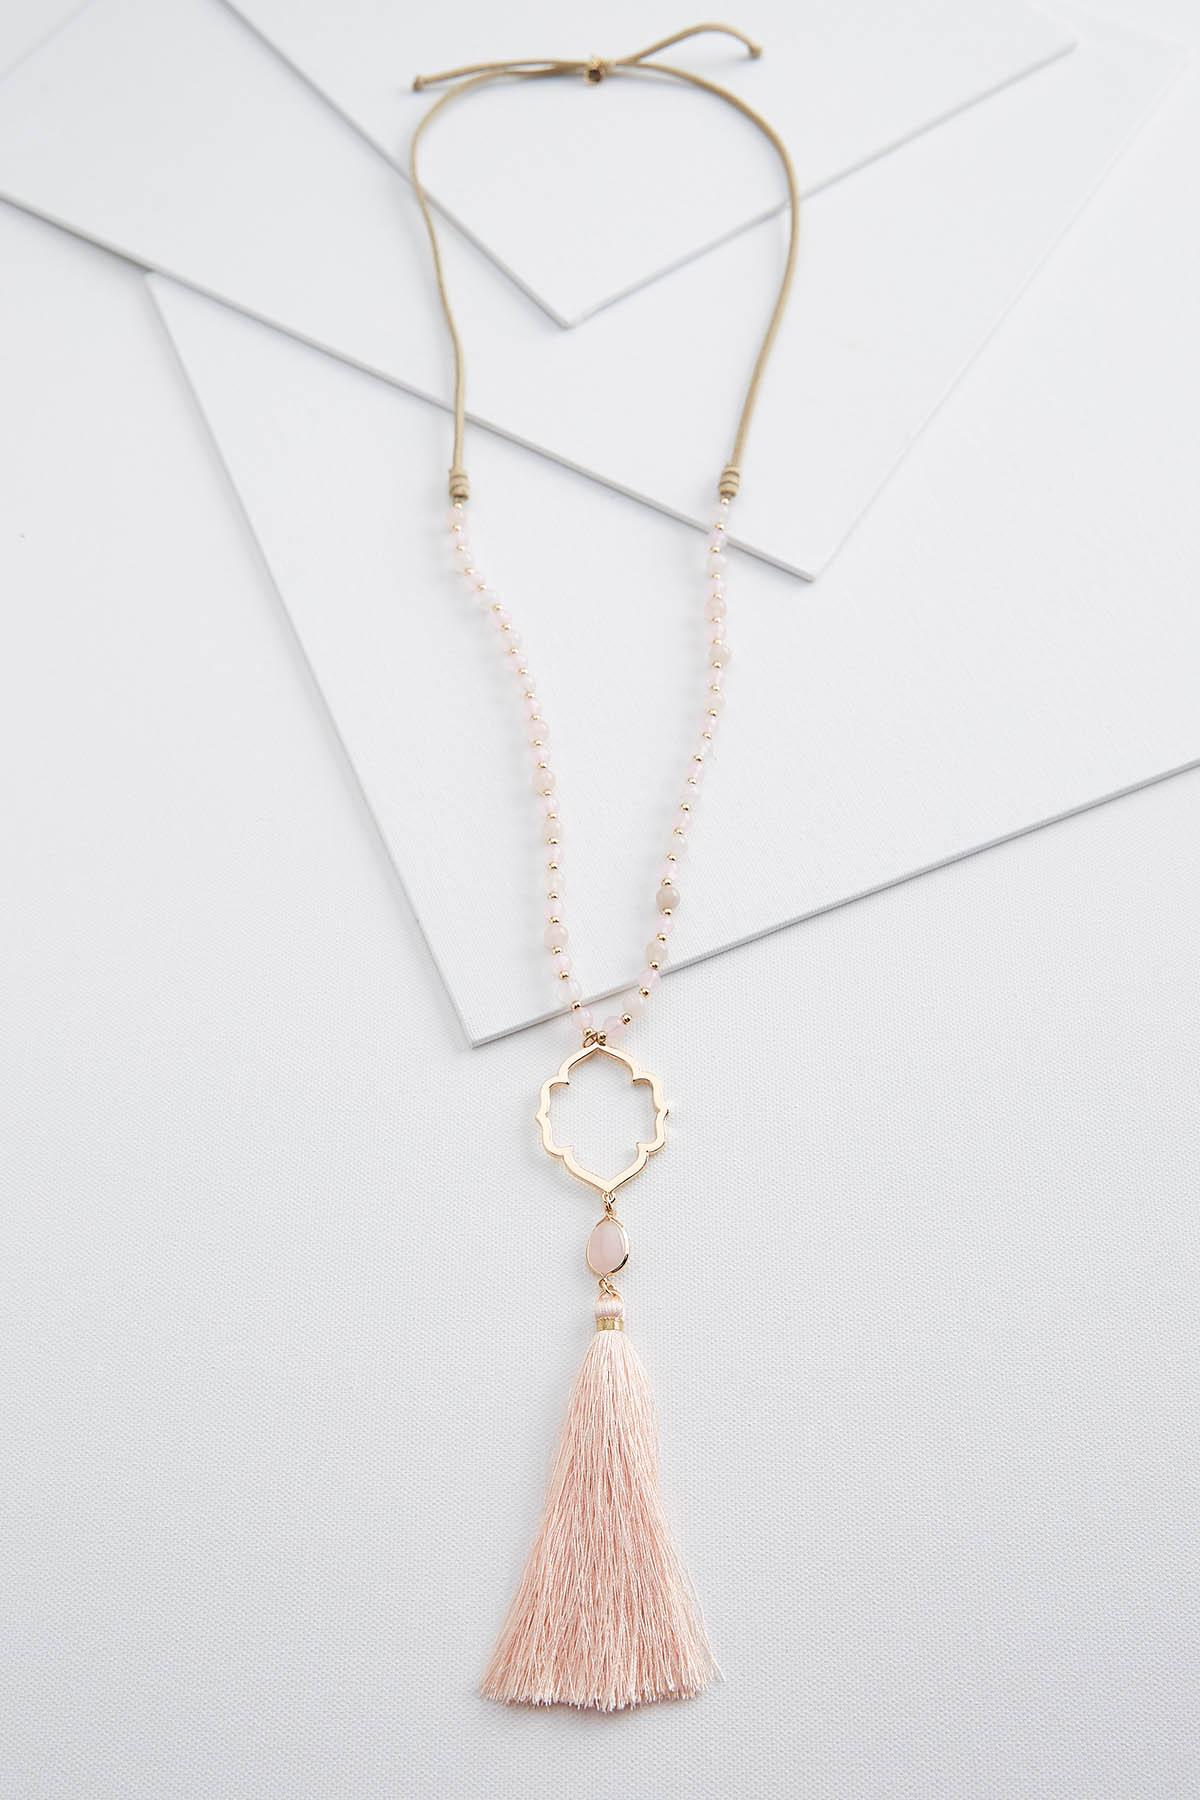 Rosy Pendant Necklace